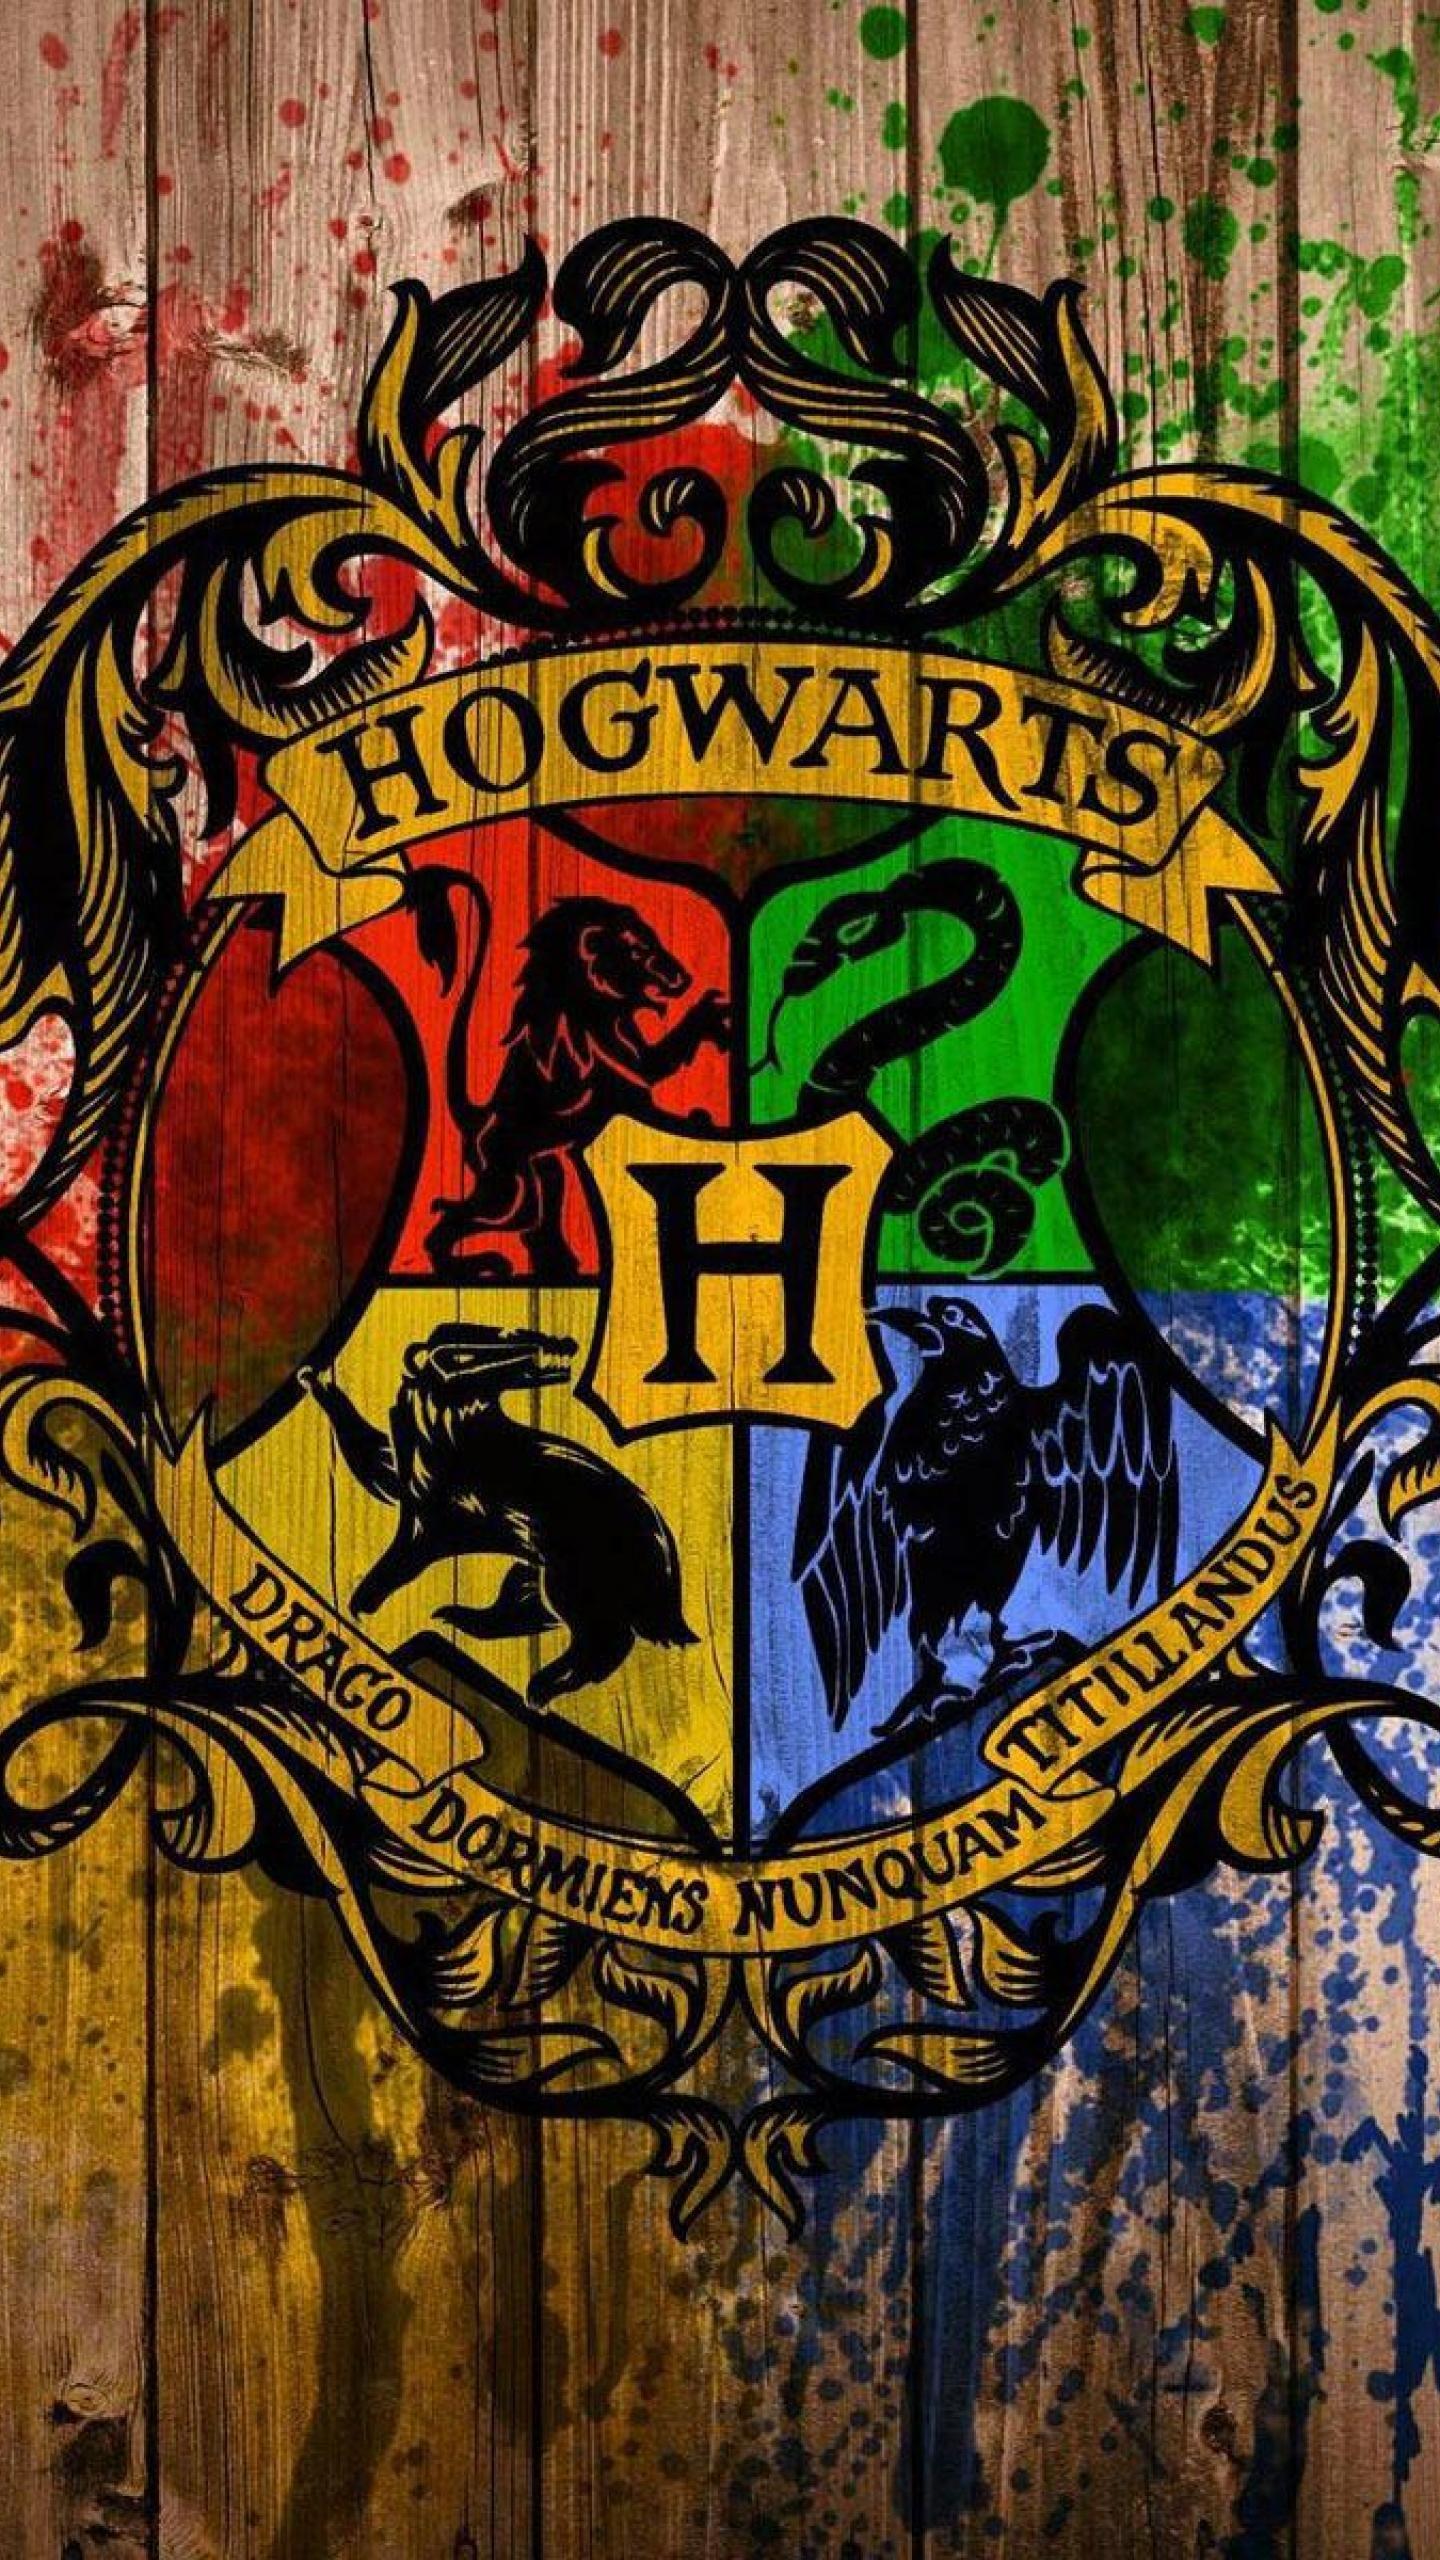 Amazing Wallpaper Harry Potter Galaxy S6 - a7795b0620312da718bce04d62920749  Image_419392.jpg